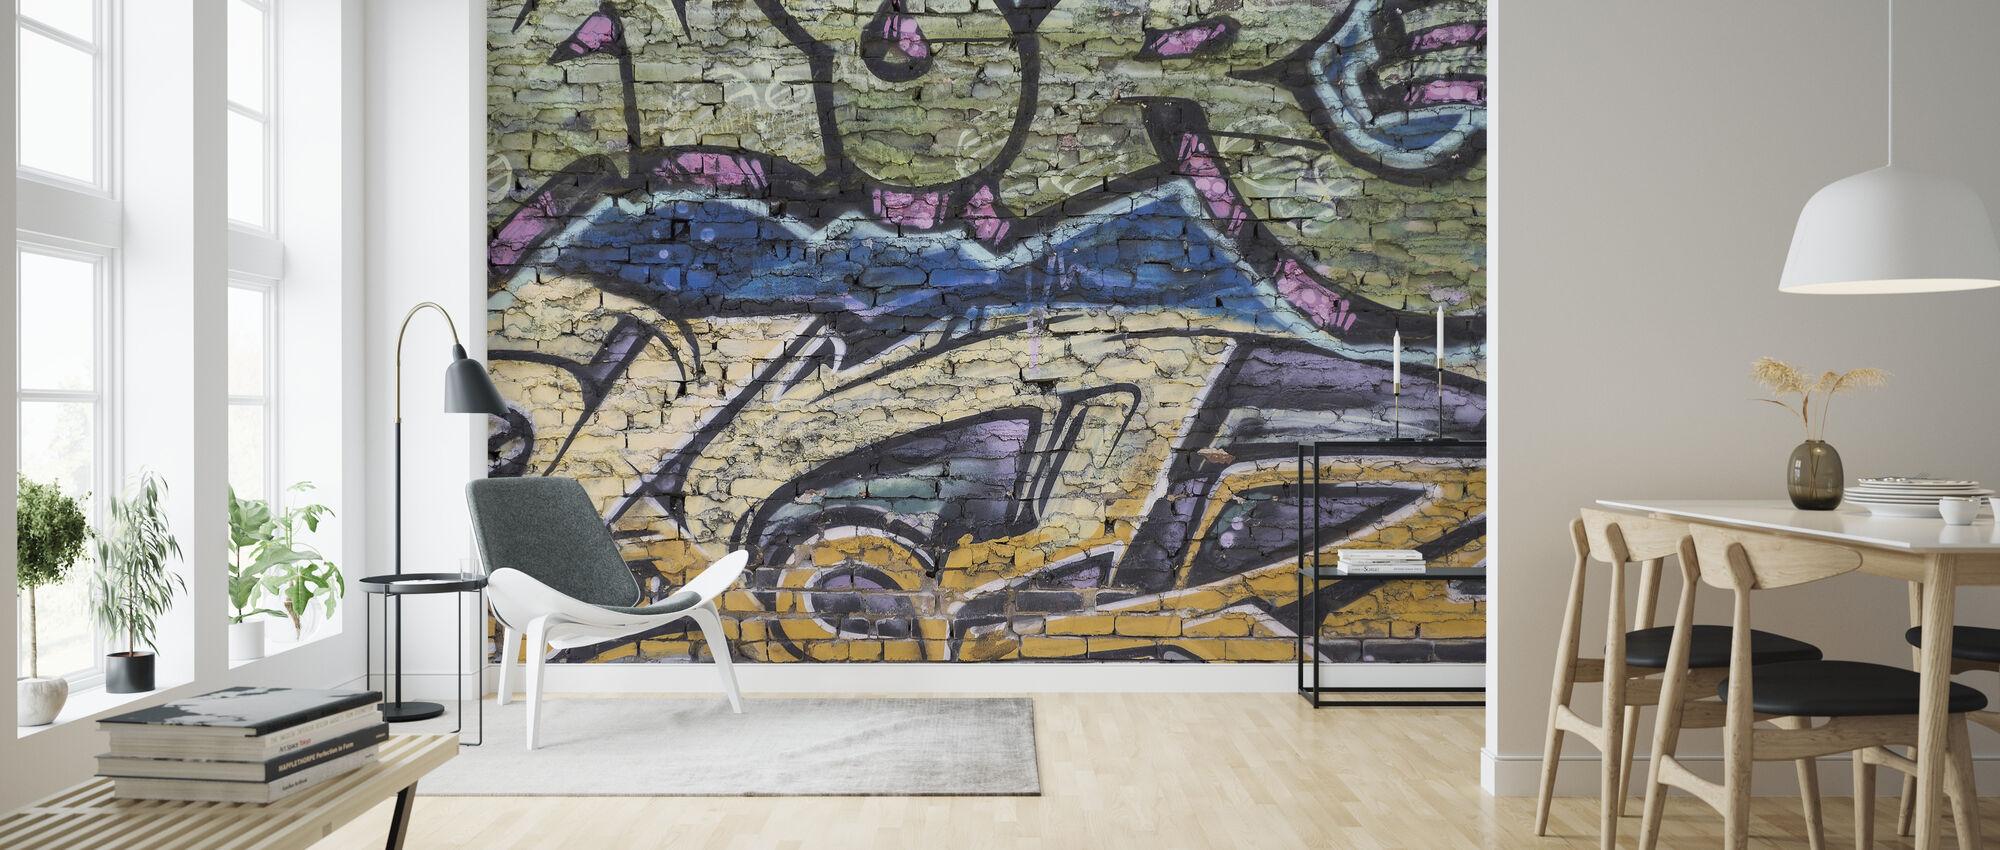 Street Art Wall - Tapet - Stue